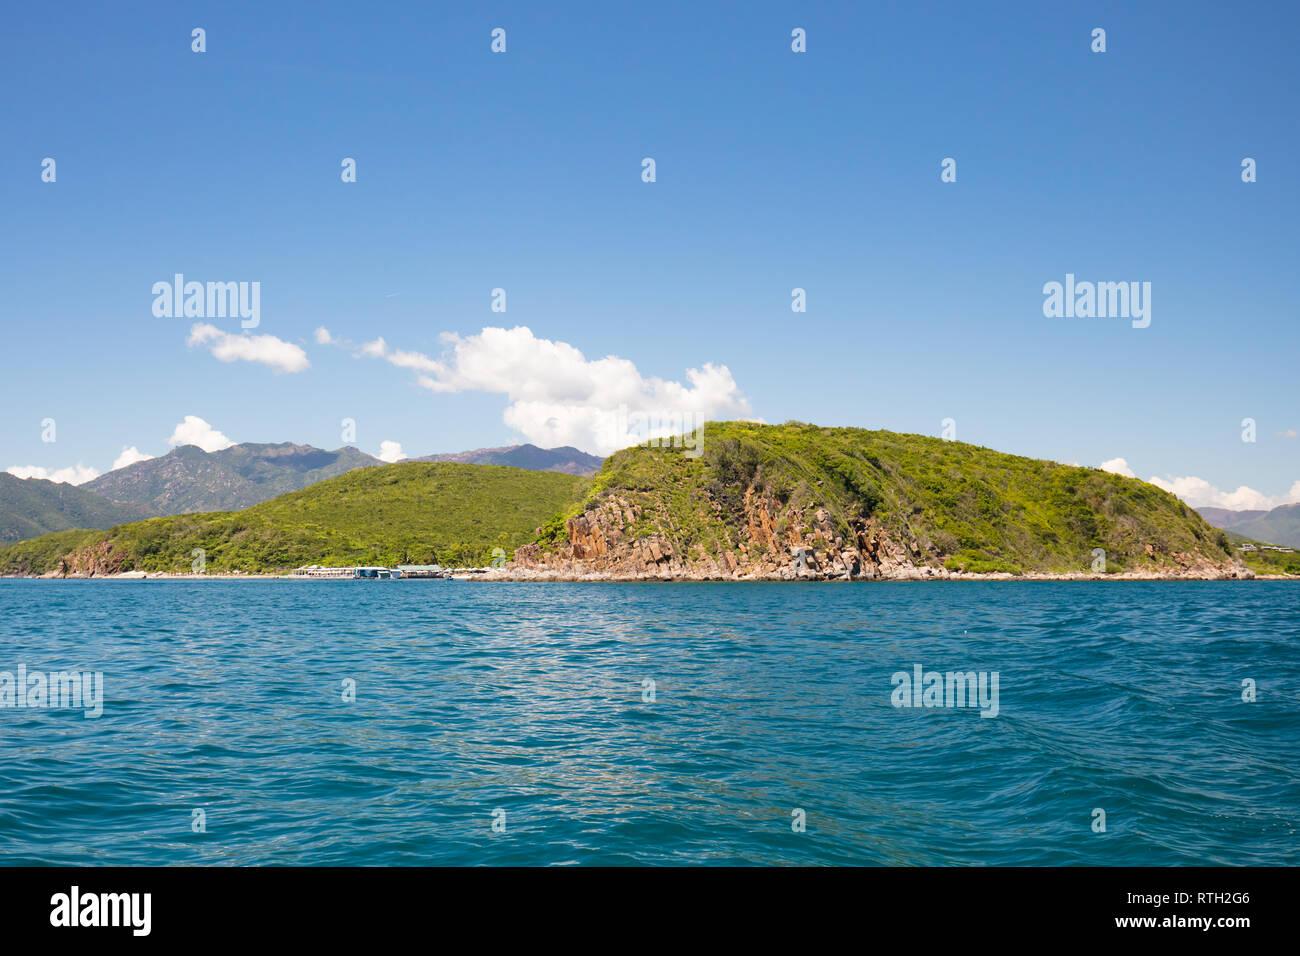 Nha Trang Island Landscape - Stock Image